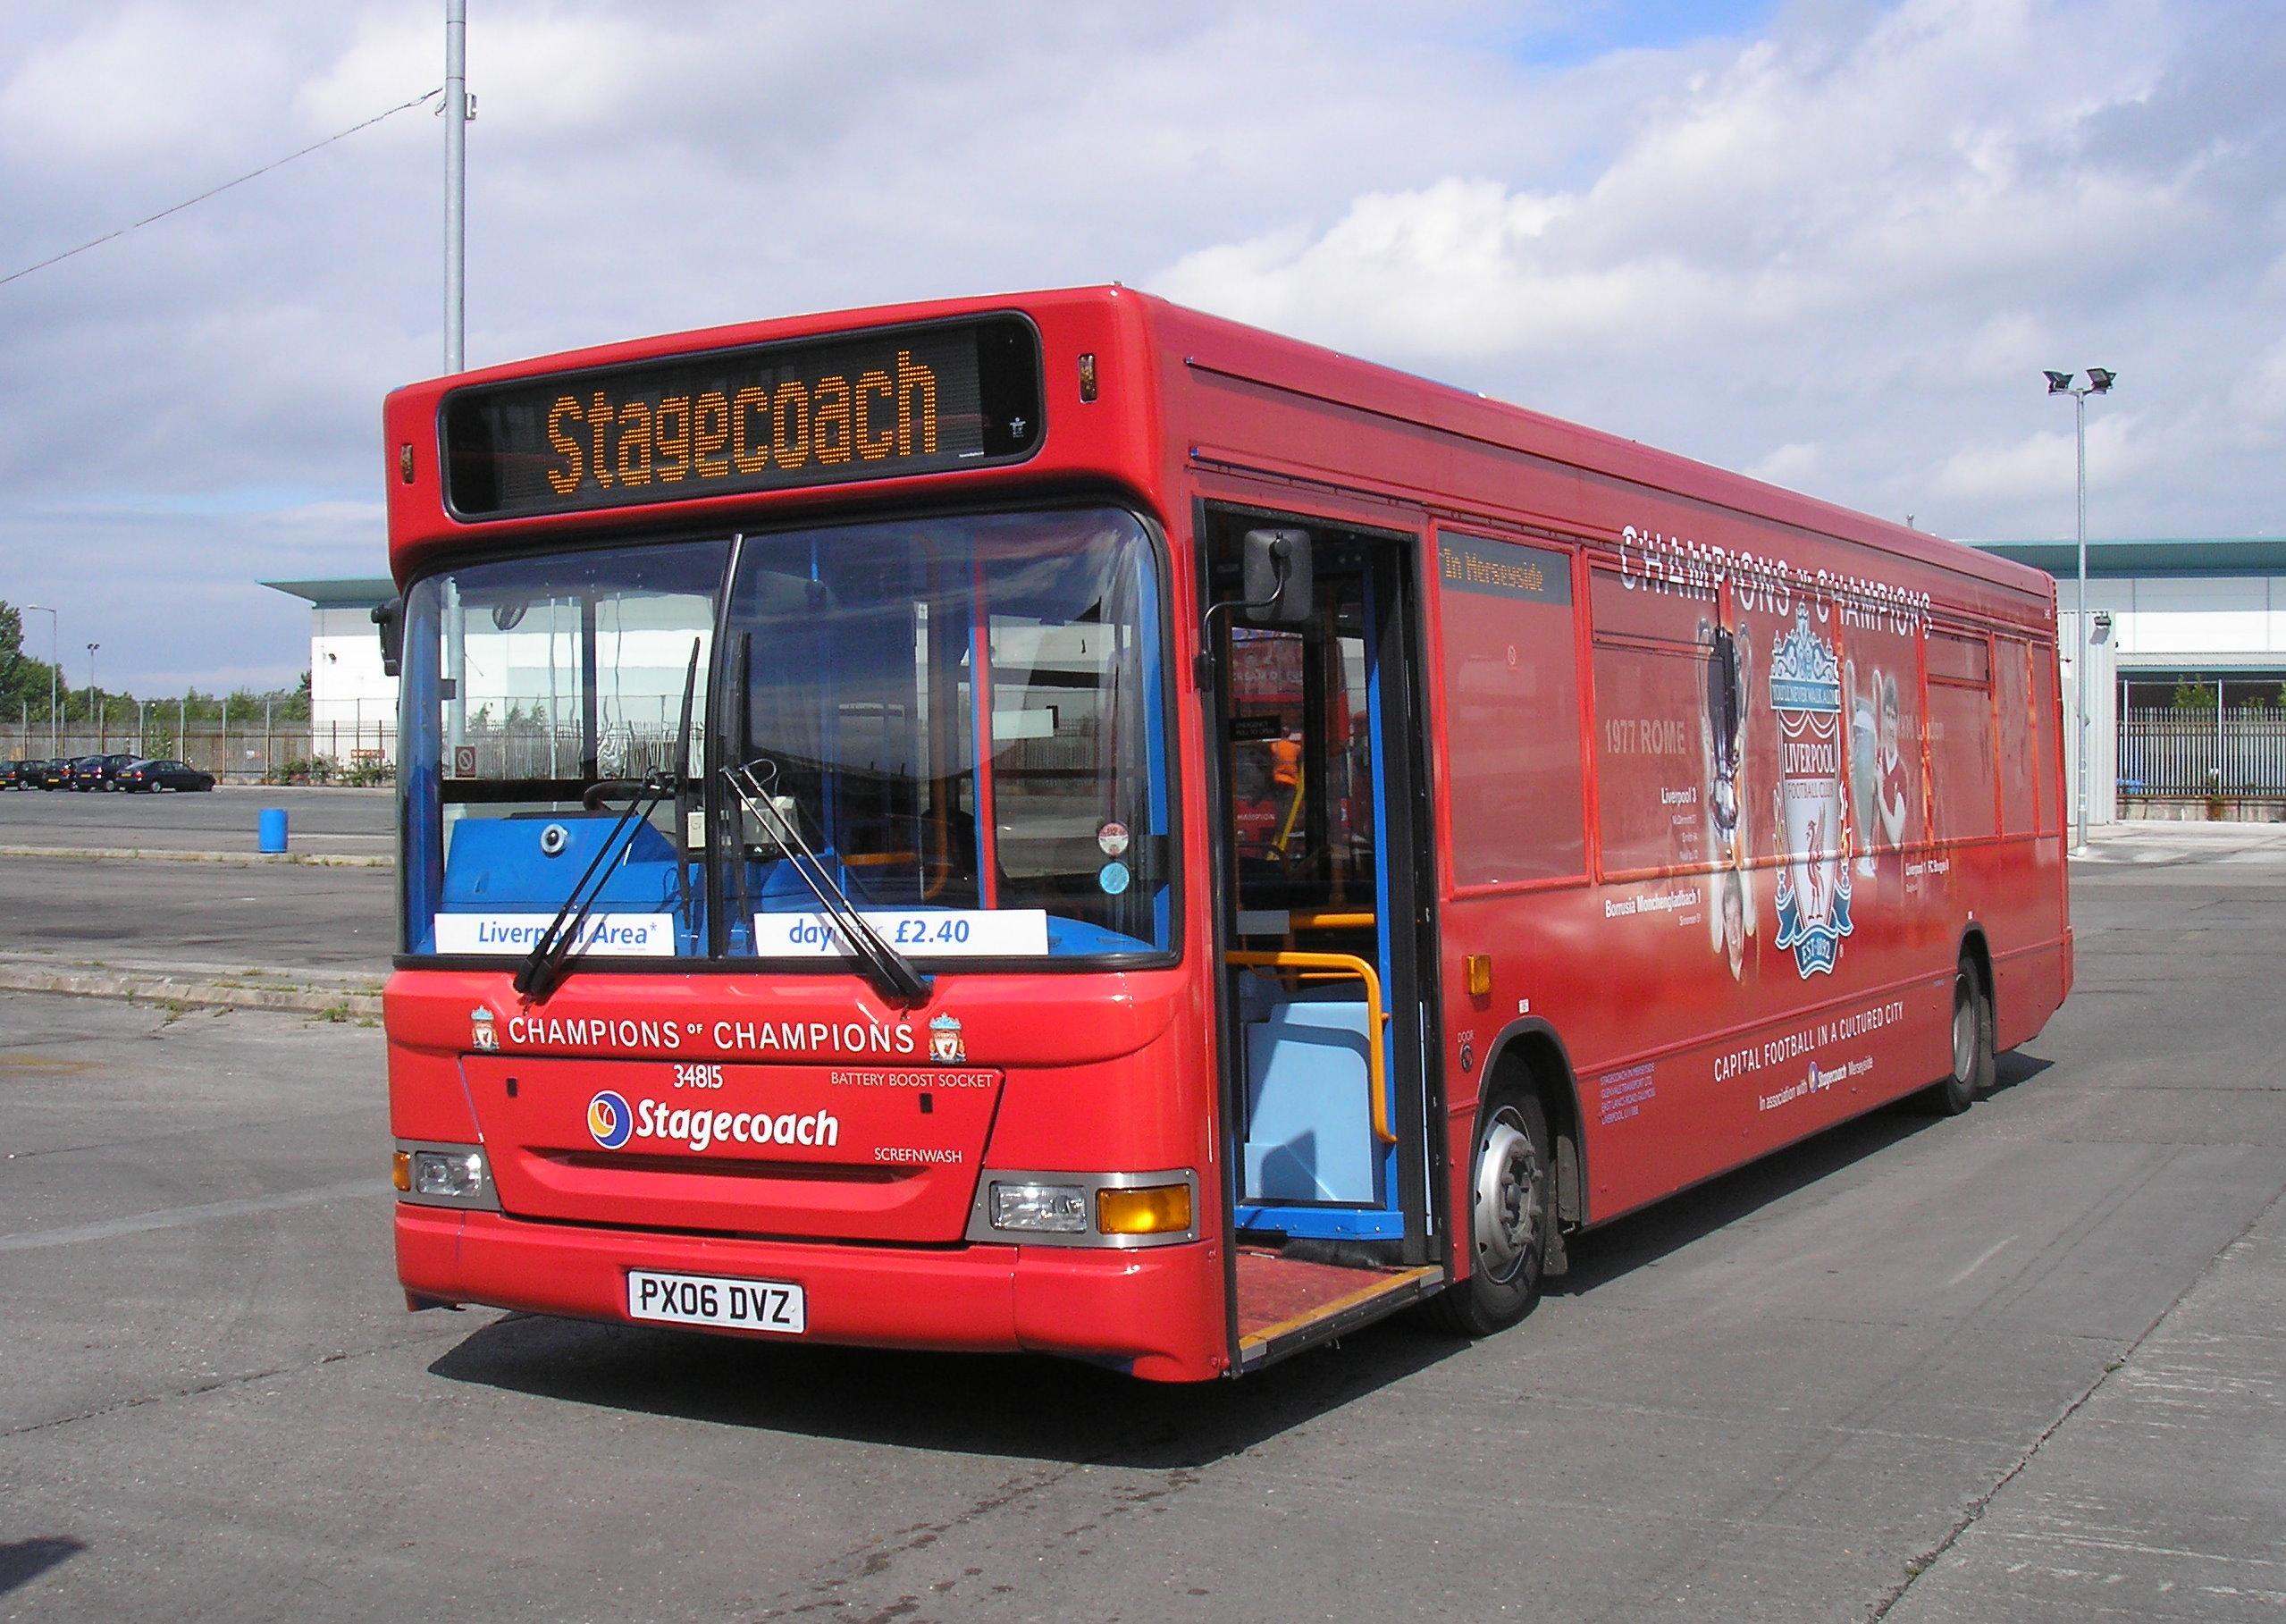 File:Stagecoach Merseyside Alexander Dart SLF 34815 jpg - Wikimedia